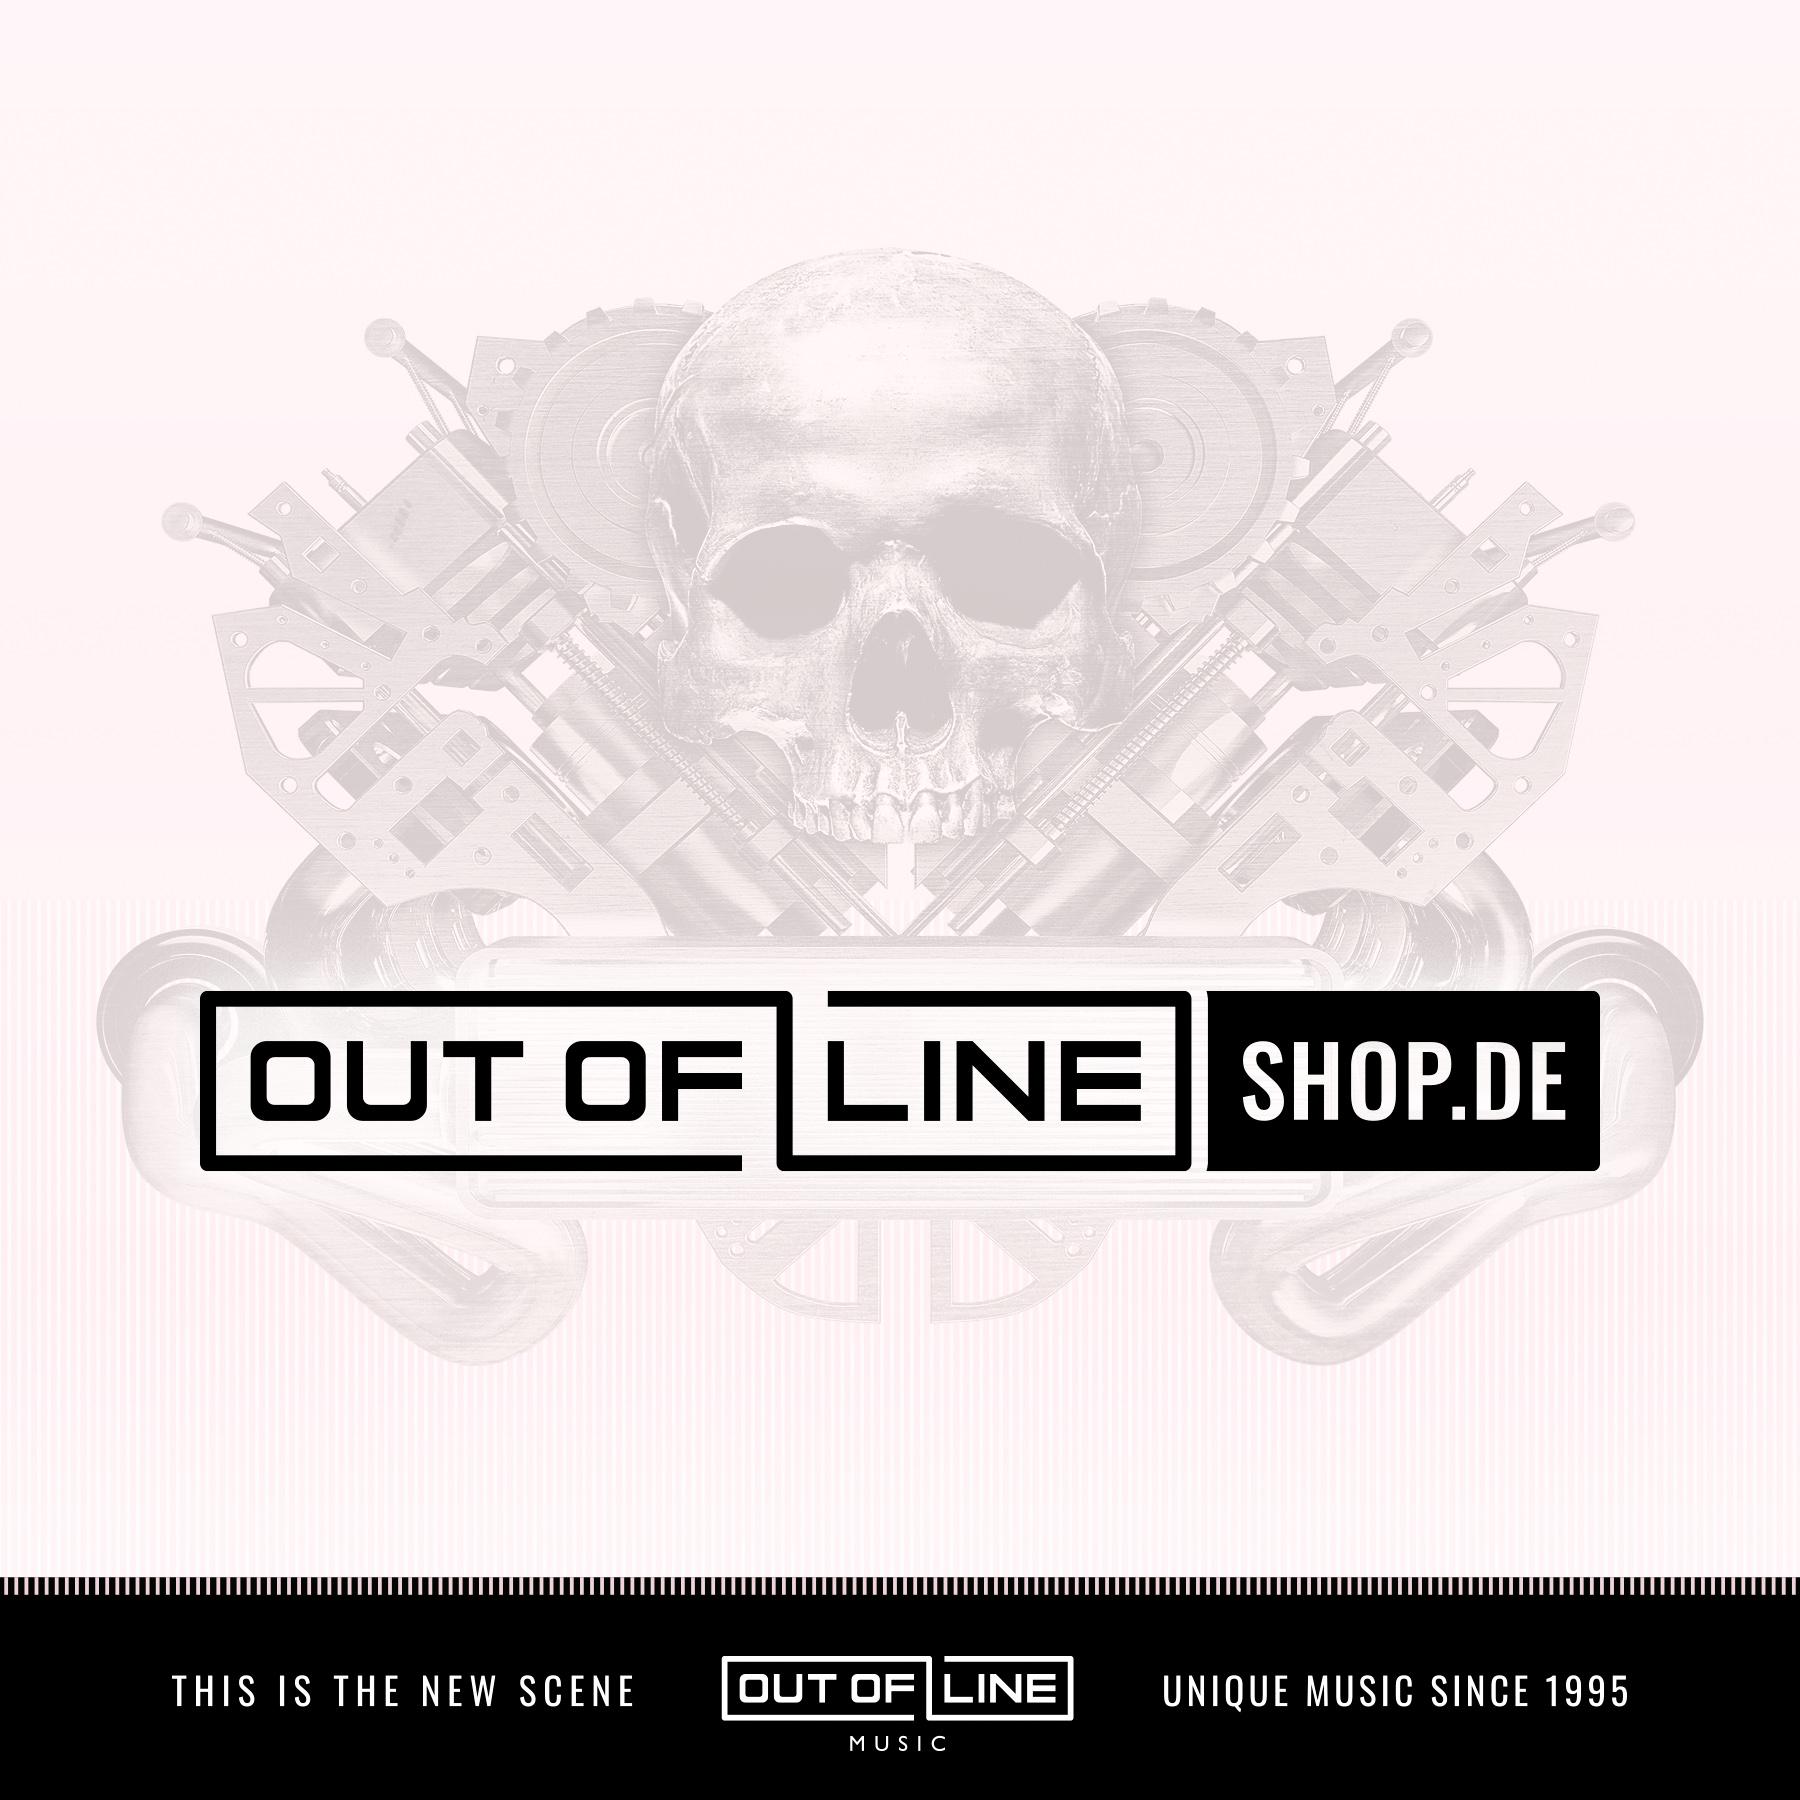 Mors Subita - Extinction Era - CD/LP/T-Shirt Bundle